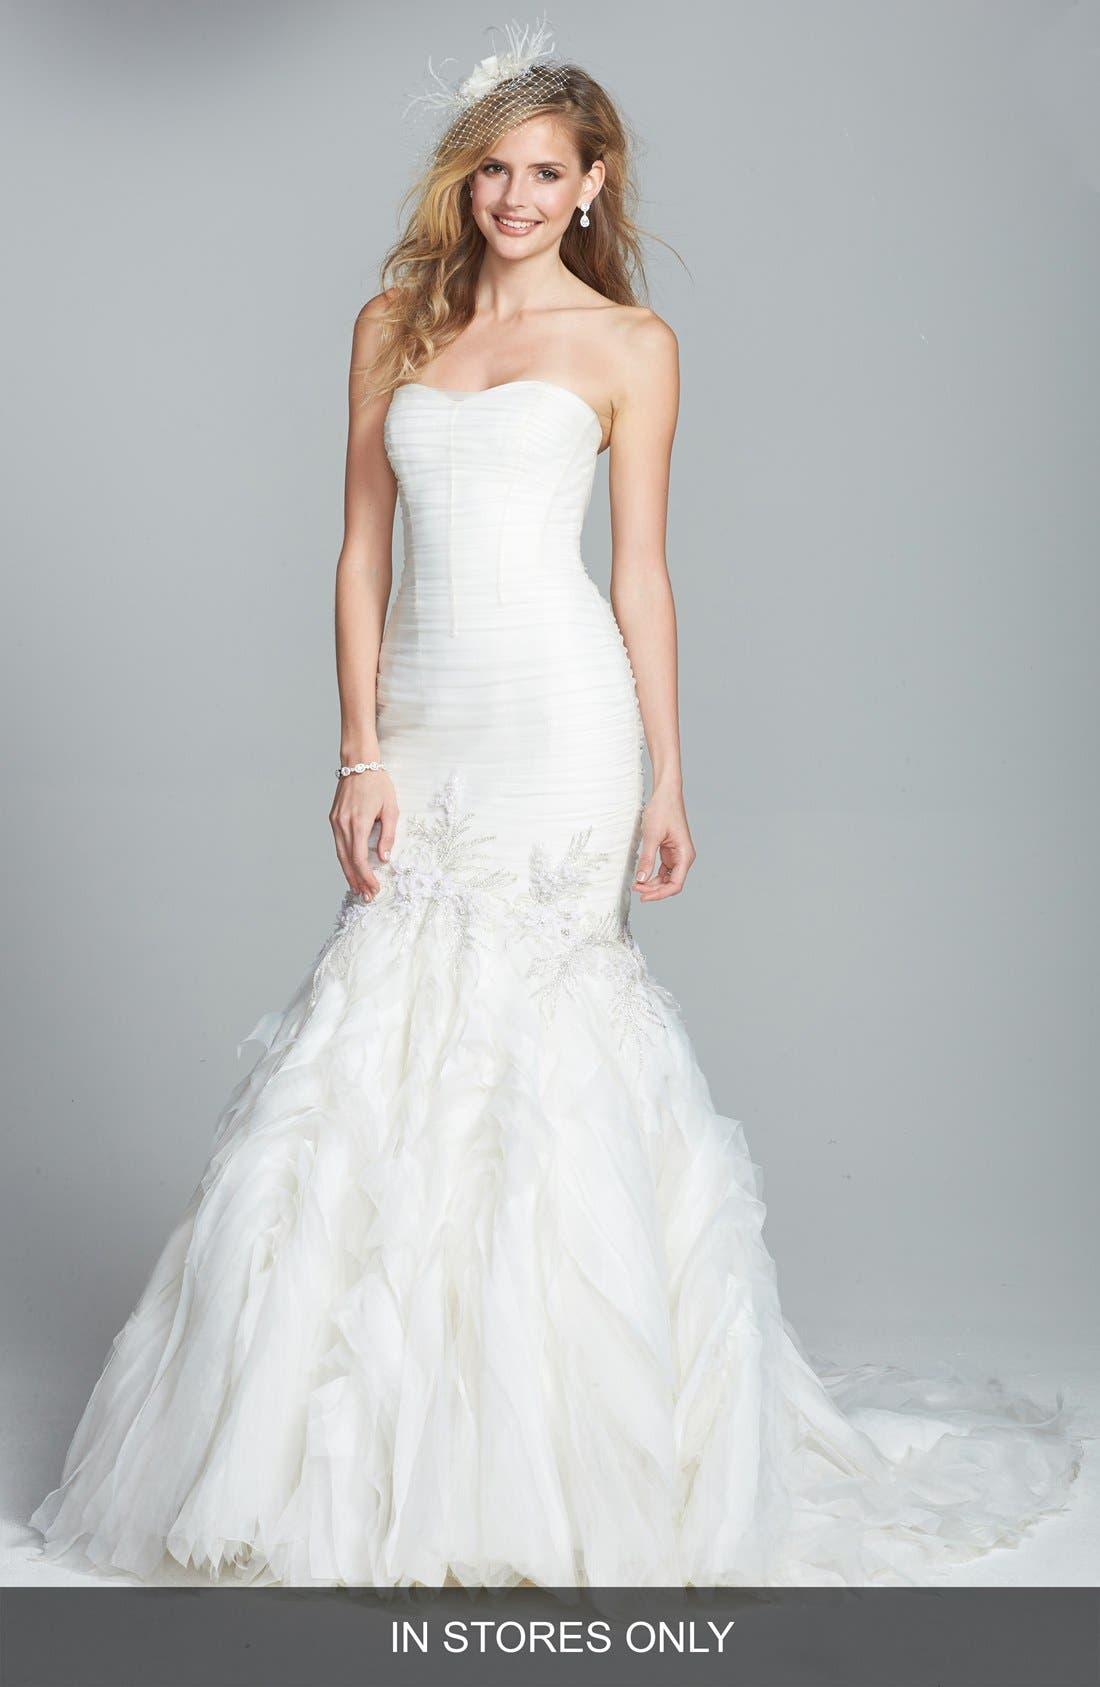 Alternate Image 1 Selected - Badgley Mischka Bridal 'Bridgette' Embellished Tulle Mermaid Dress (In Stores Only)